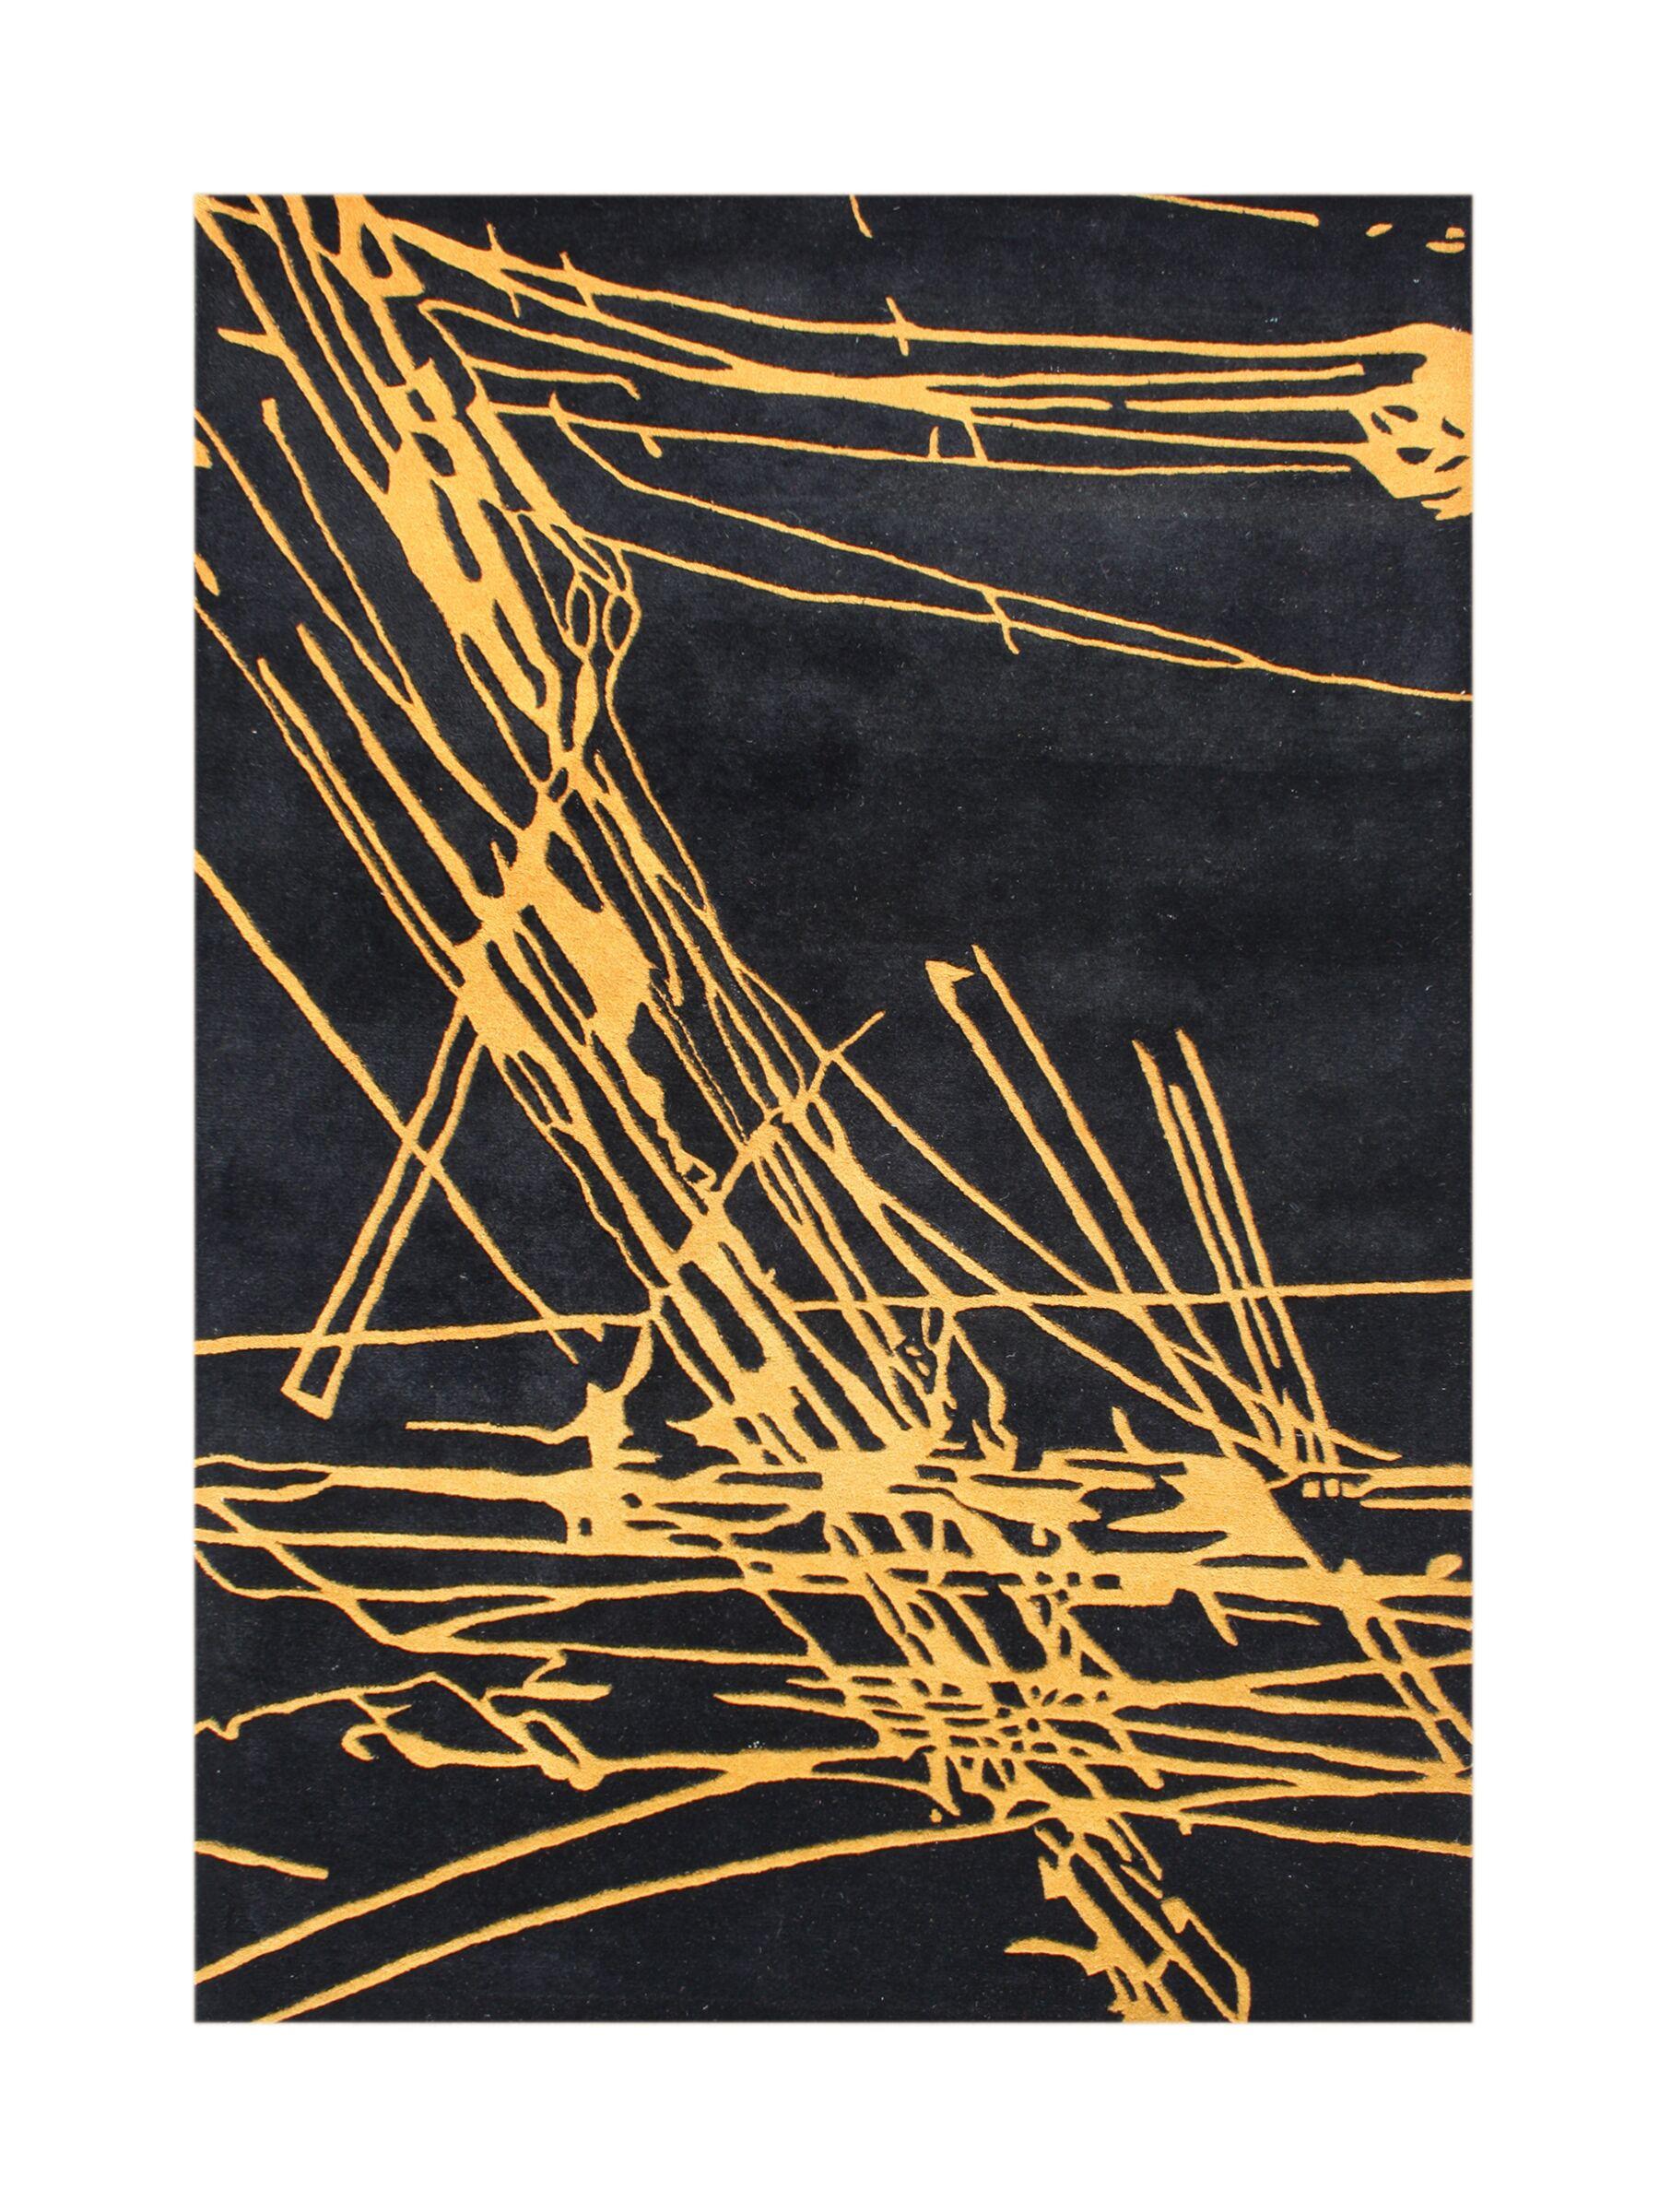 Sunnyside Hand-Tufted Black/Yellow Area Rug Rug Size: Rectangle 5' x 8'